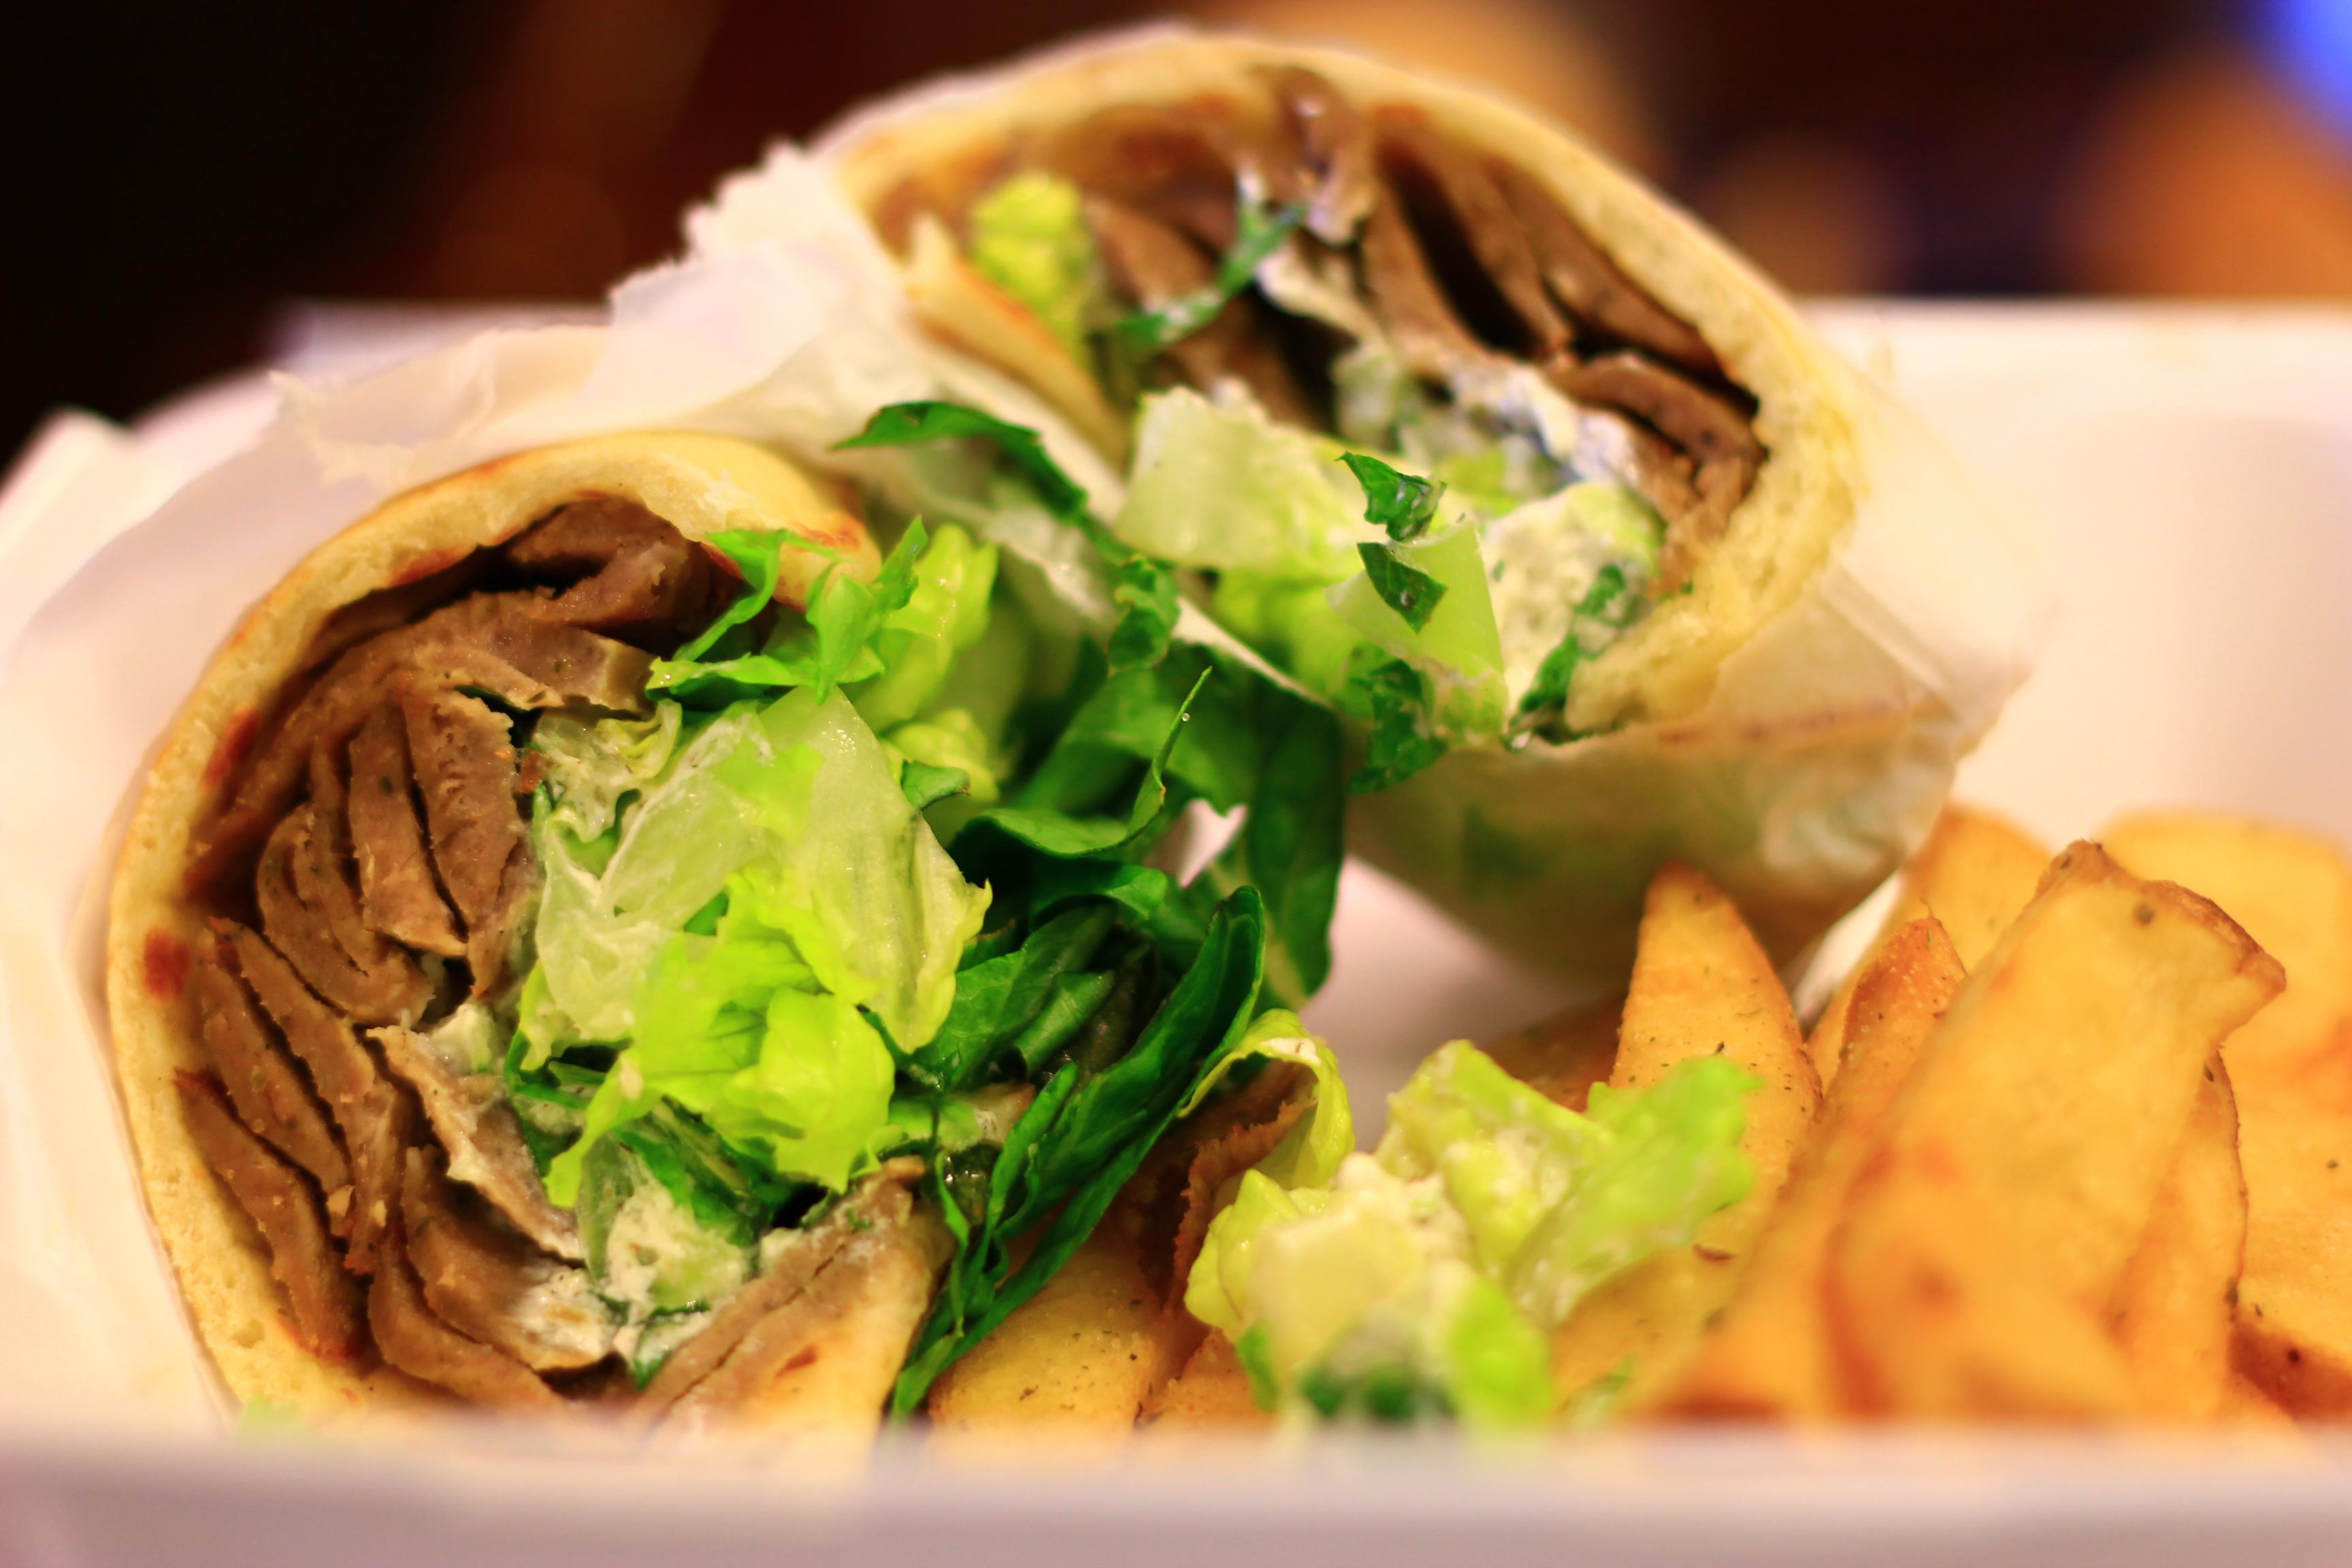 Img 3045 for Acropolis cuisine metairie